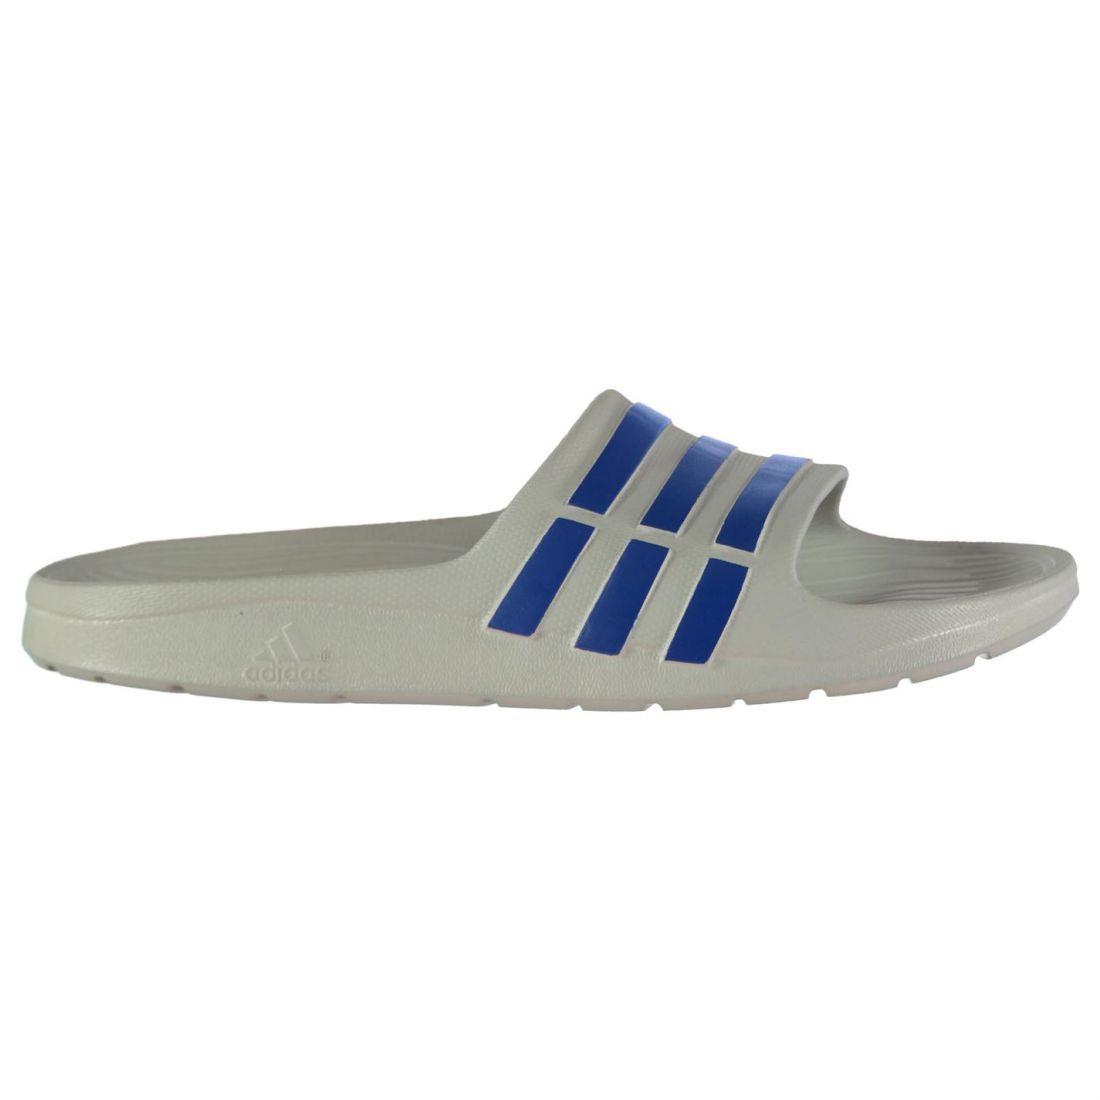 2065e14cd4dd3b adidas Kids Boys Duramo Slide Pool Shoes Slip On Forefoot Strap Lightweight